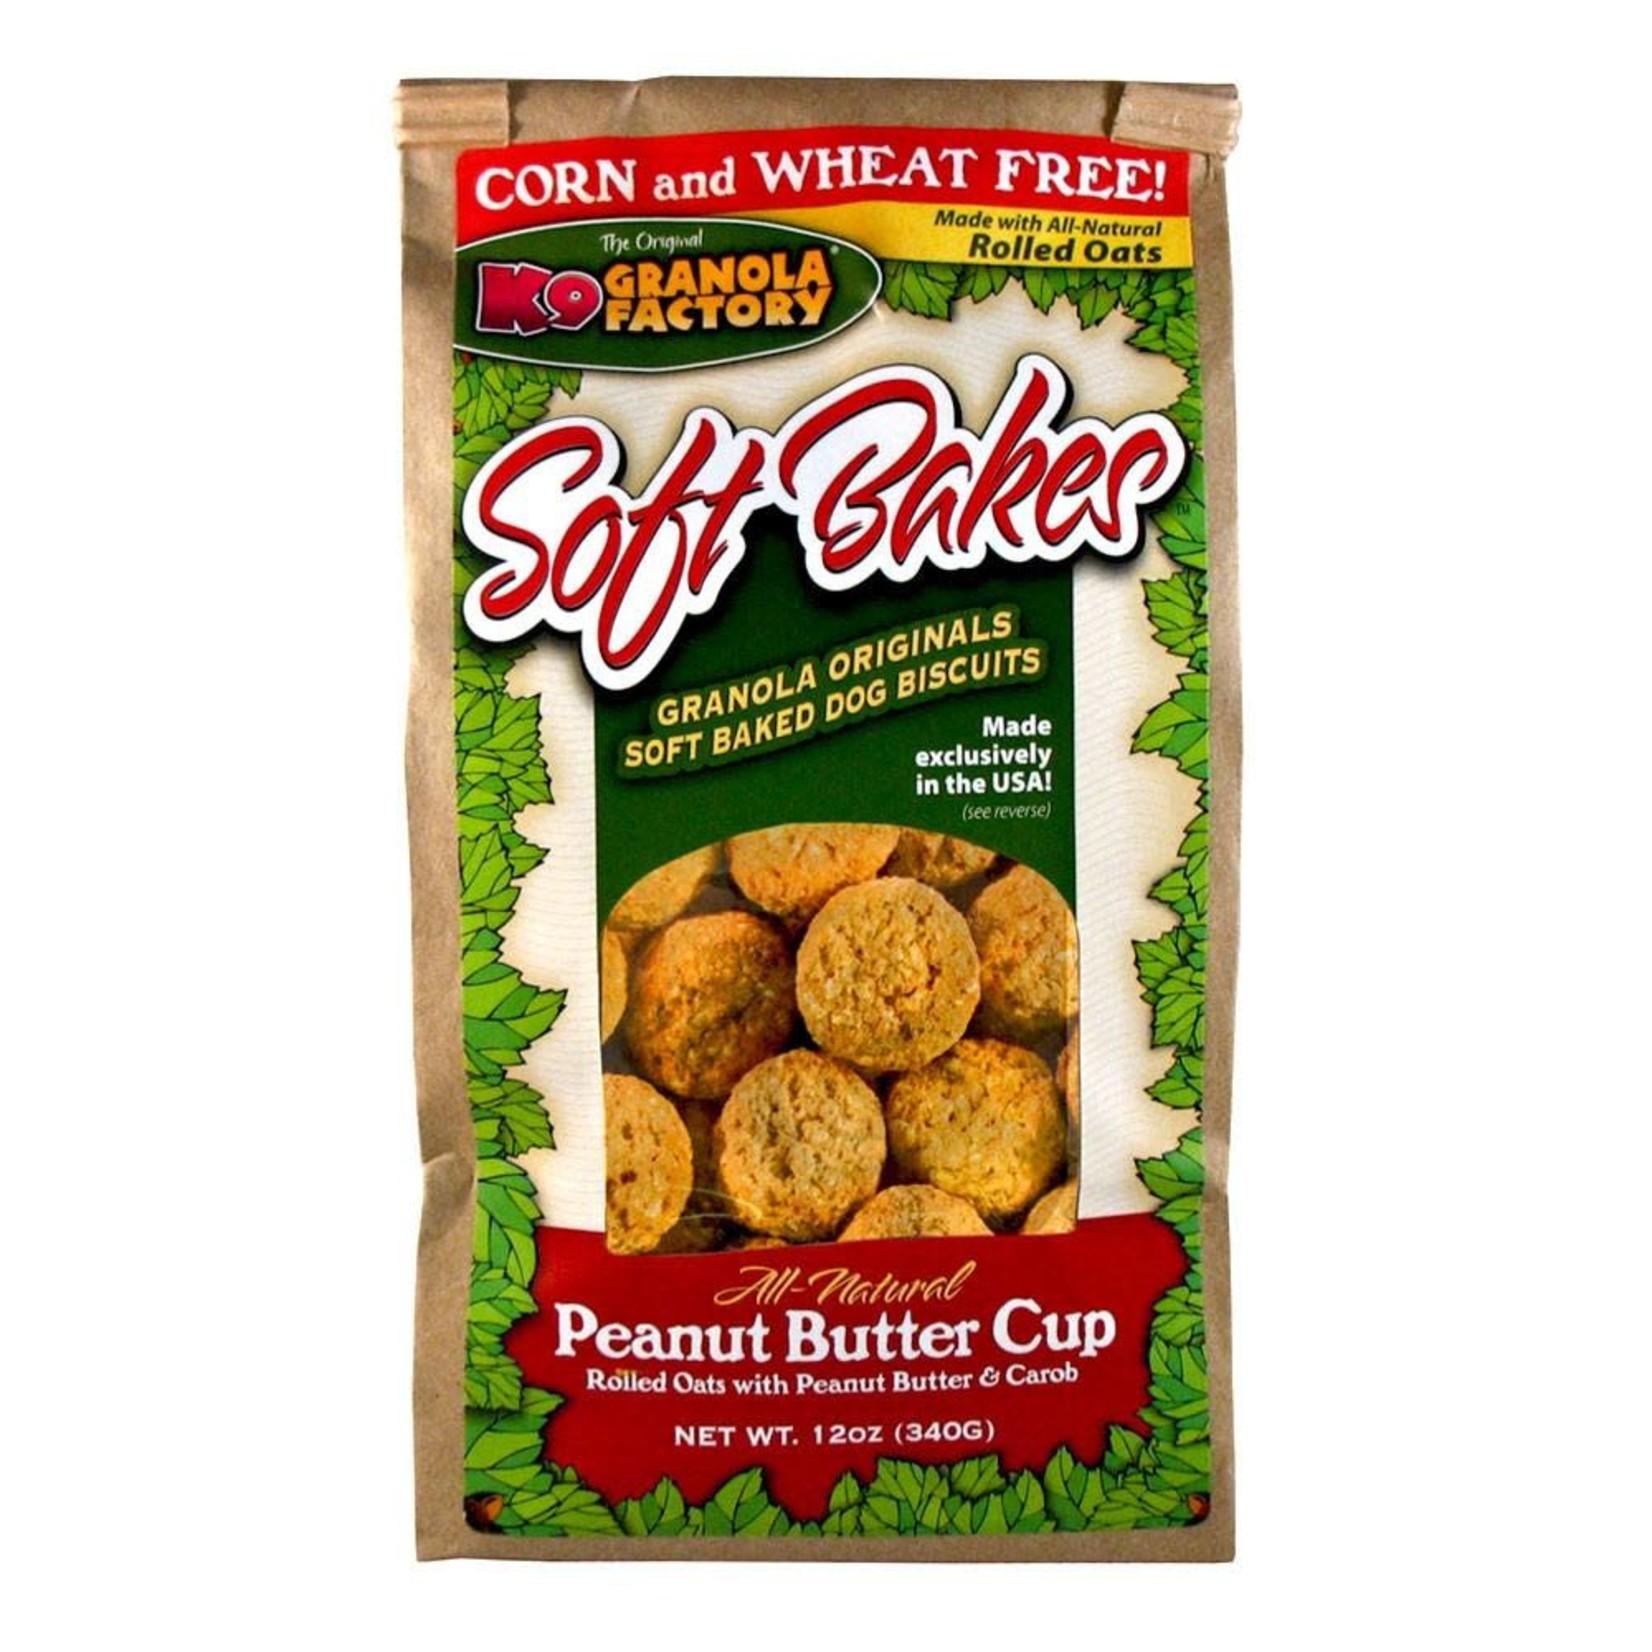 K9 Granola Factory K9 Granola Factory Soft Bakes Peanut Butter Cup Dog Treats 12oz